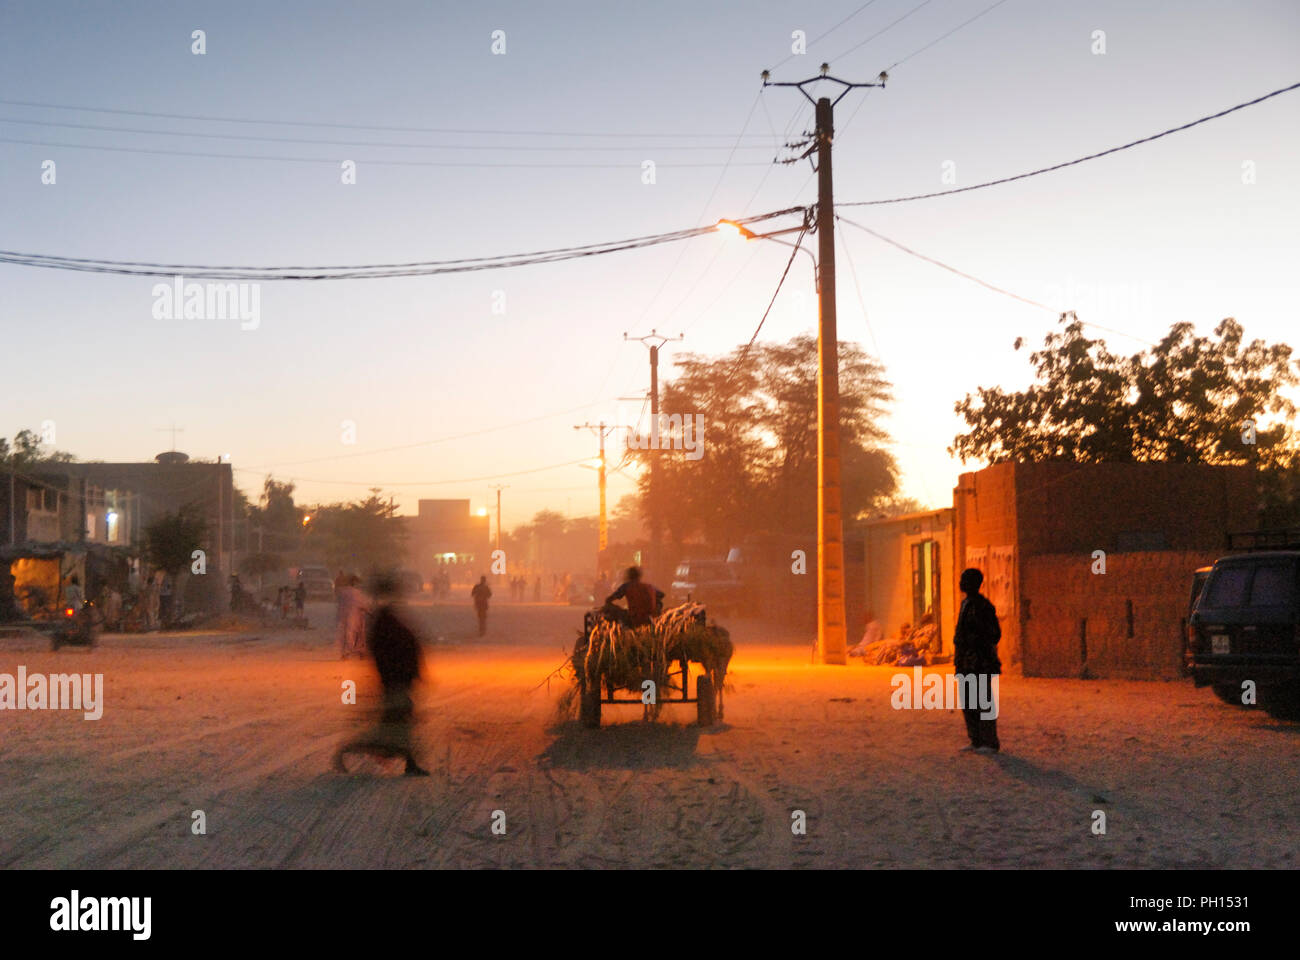 Street scene, Timbuktu, a Unesco World Heritage Site. Mali, West Africa - Stock Image